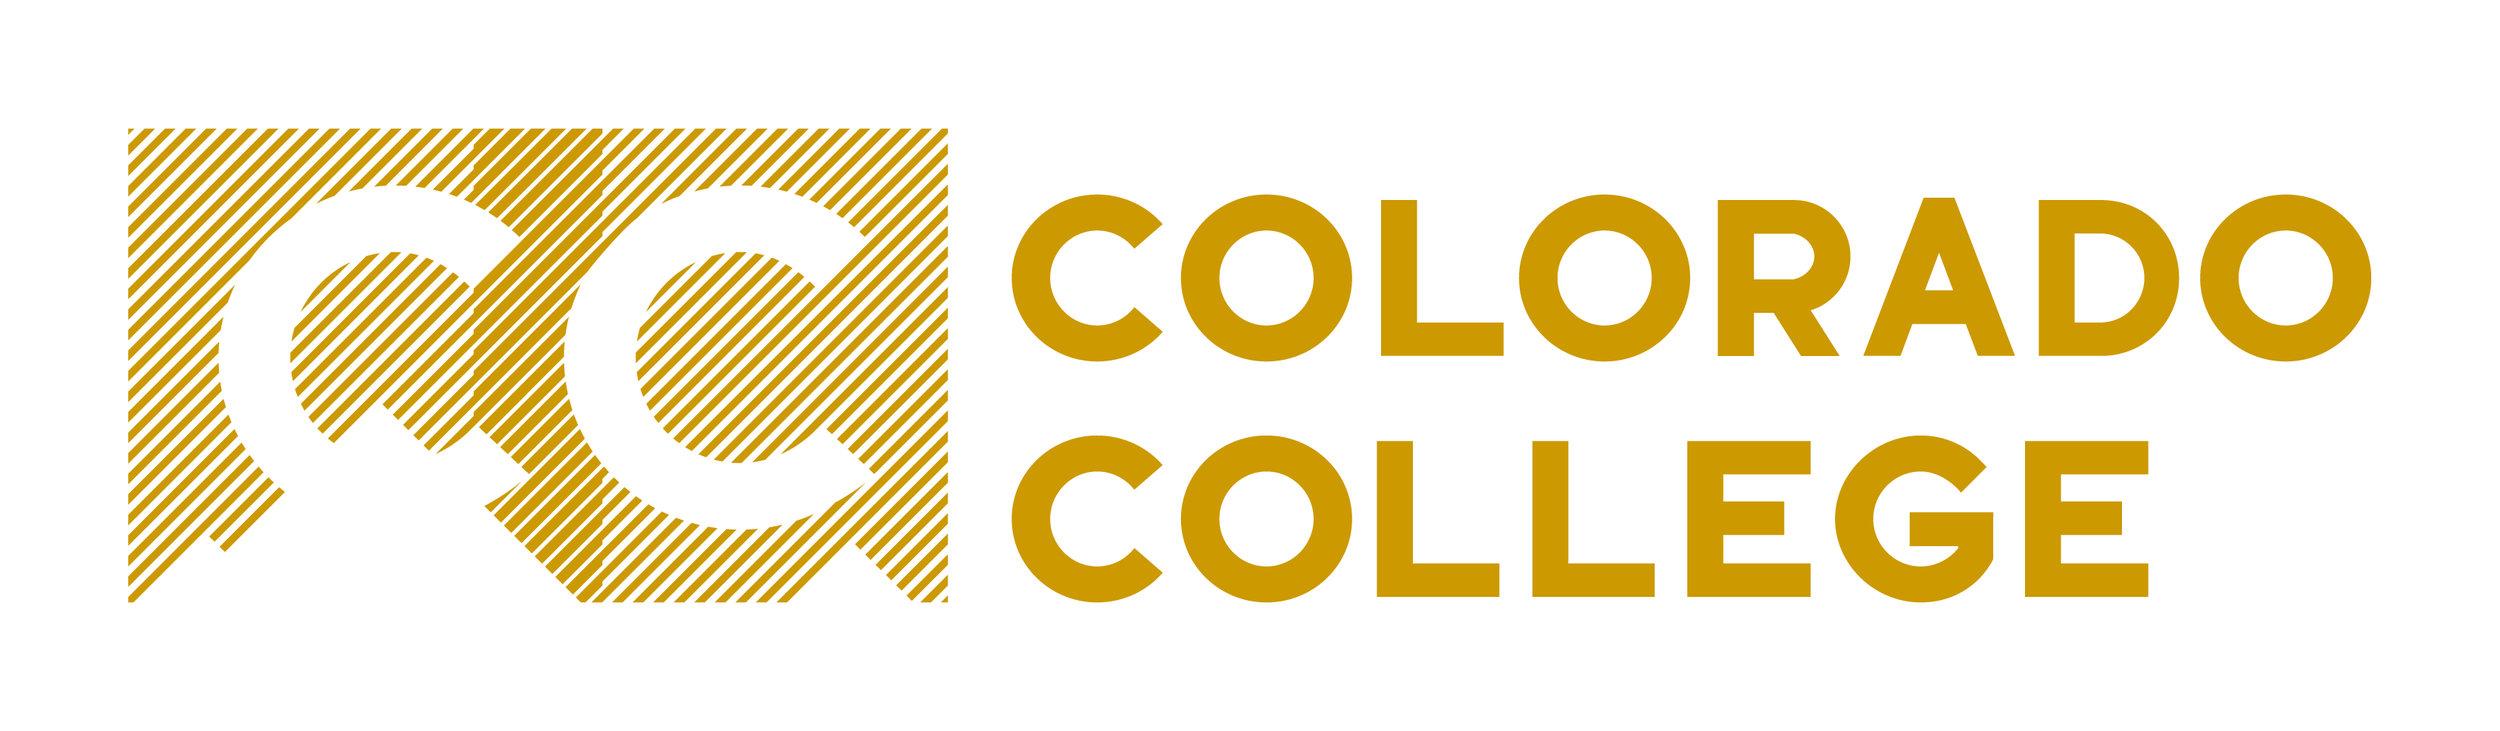 CC-LOGO-Horiz-CMYK-Diagonal-Gold.jpg